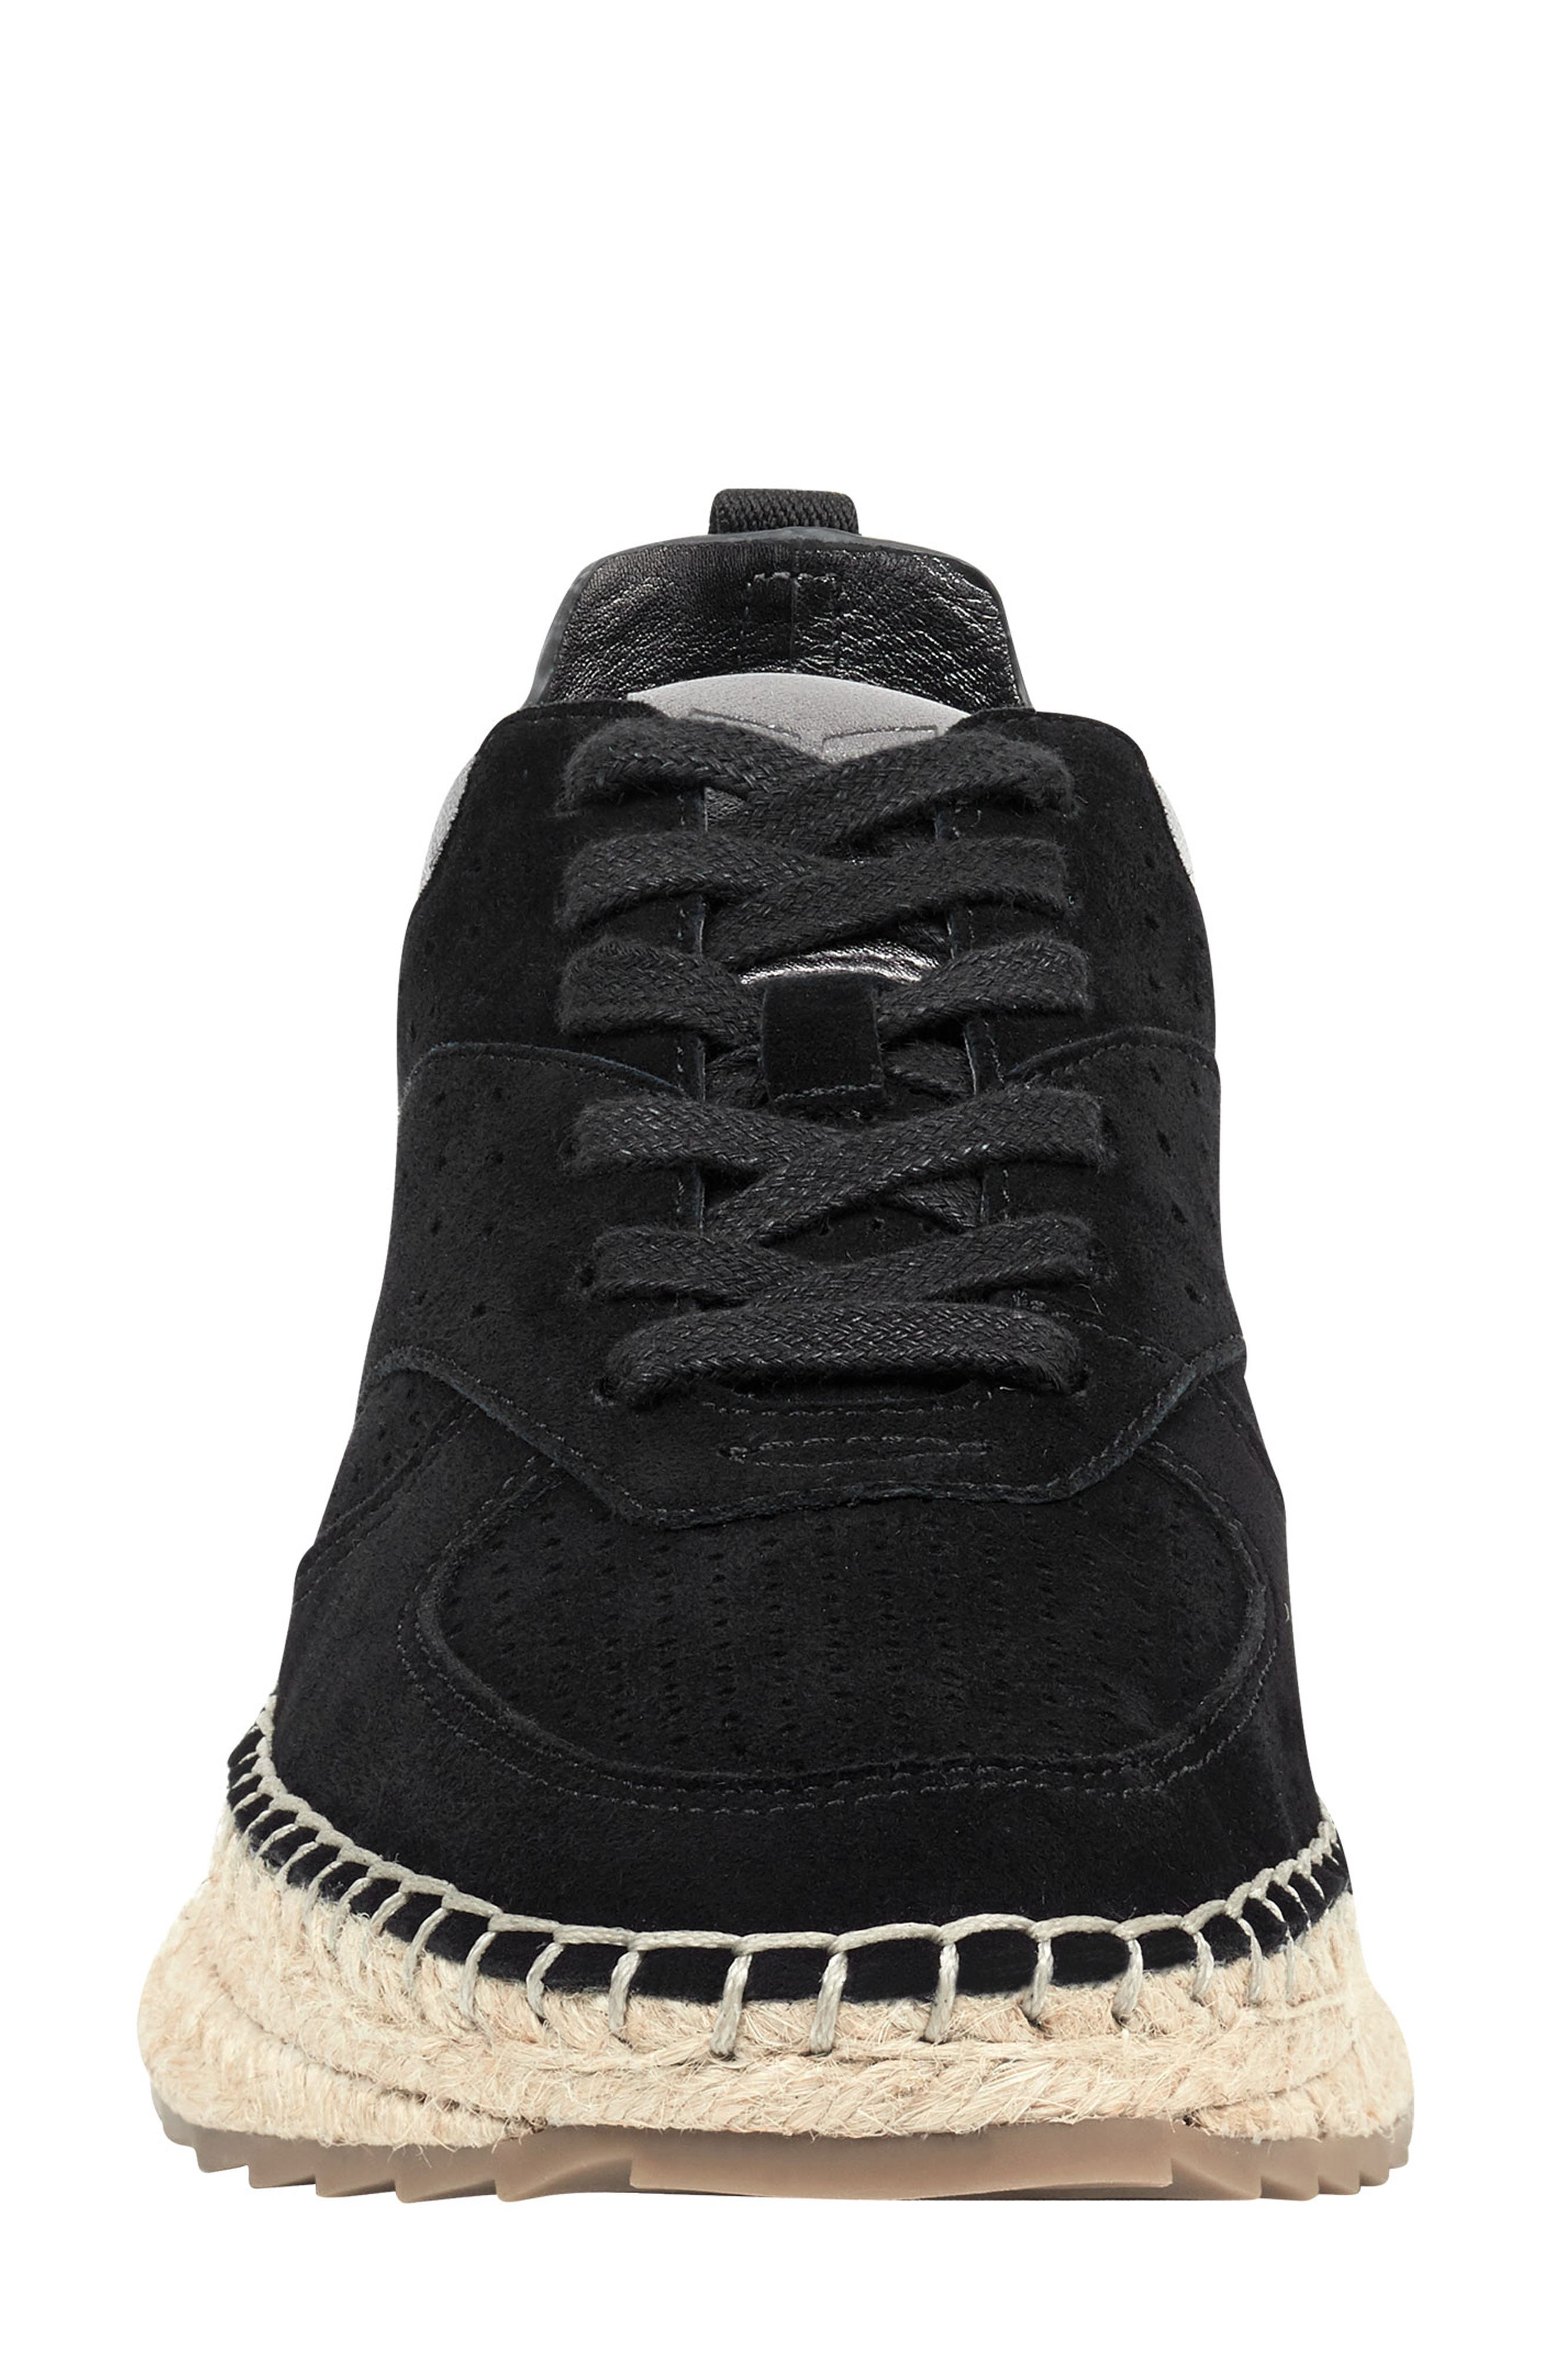 MARC FISHER LTD, Julio Sneaker, Alternate thumbnail 4, color, BLACK SUEDE